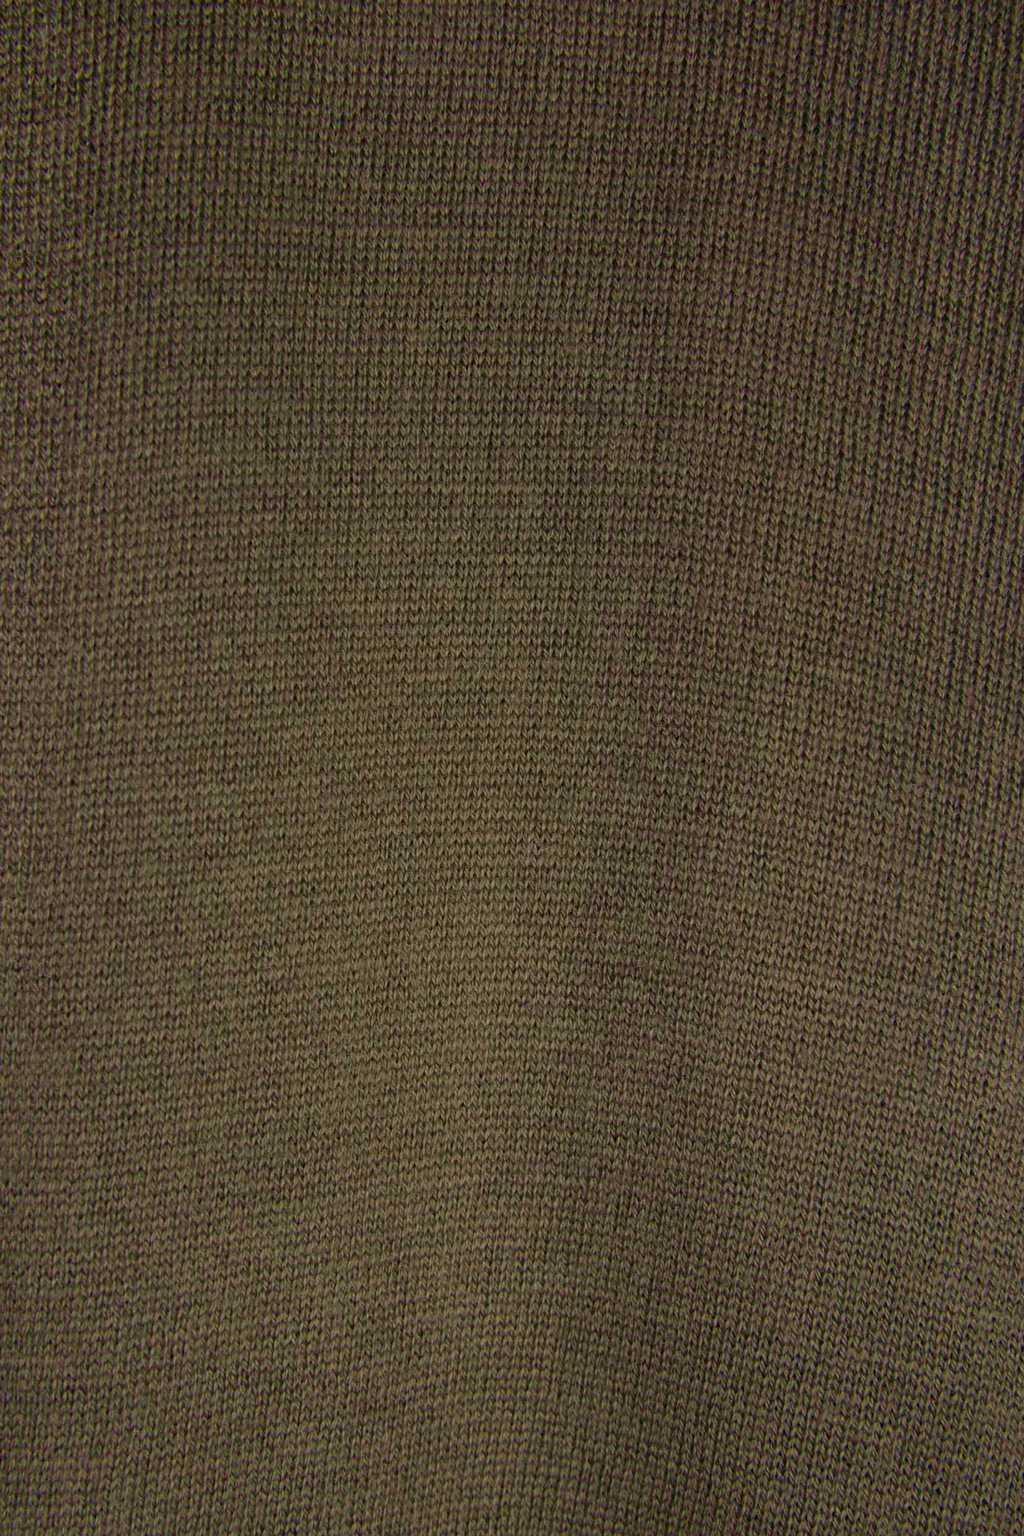 Cardigan 1406 Olive 7